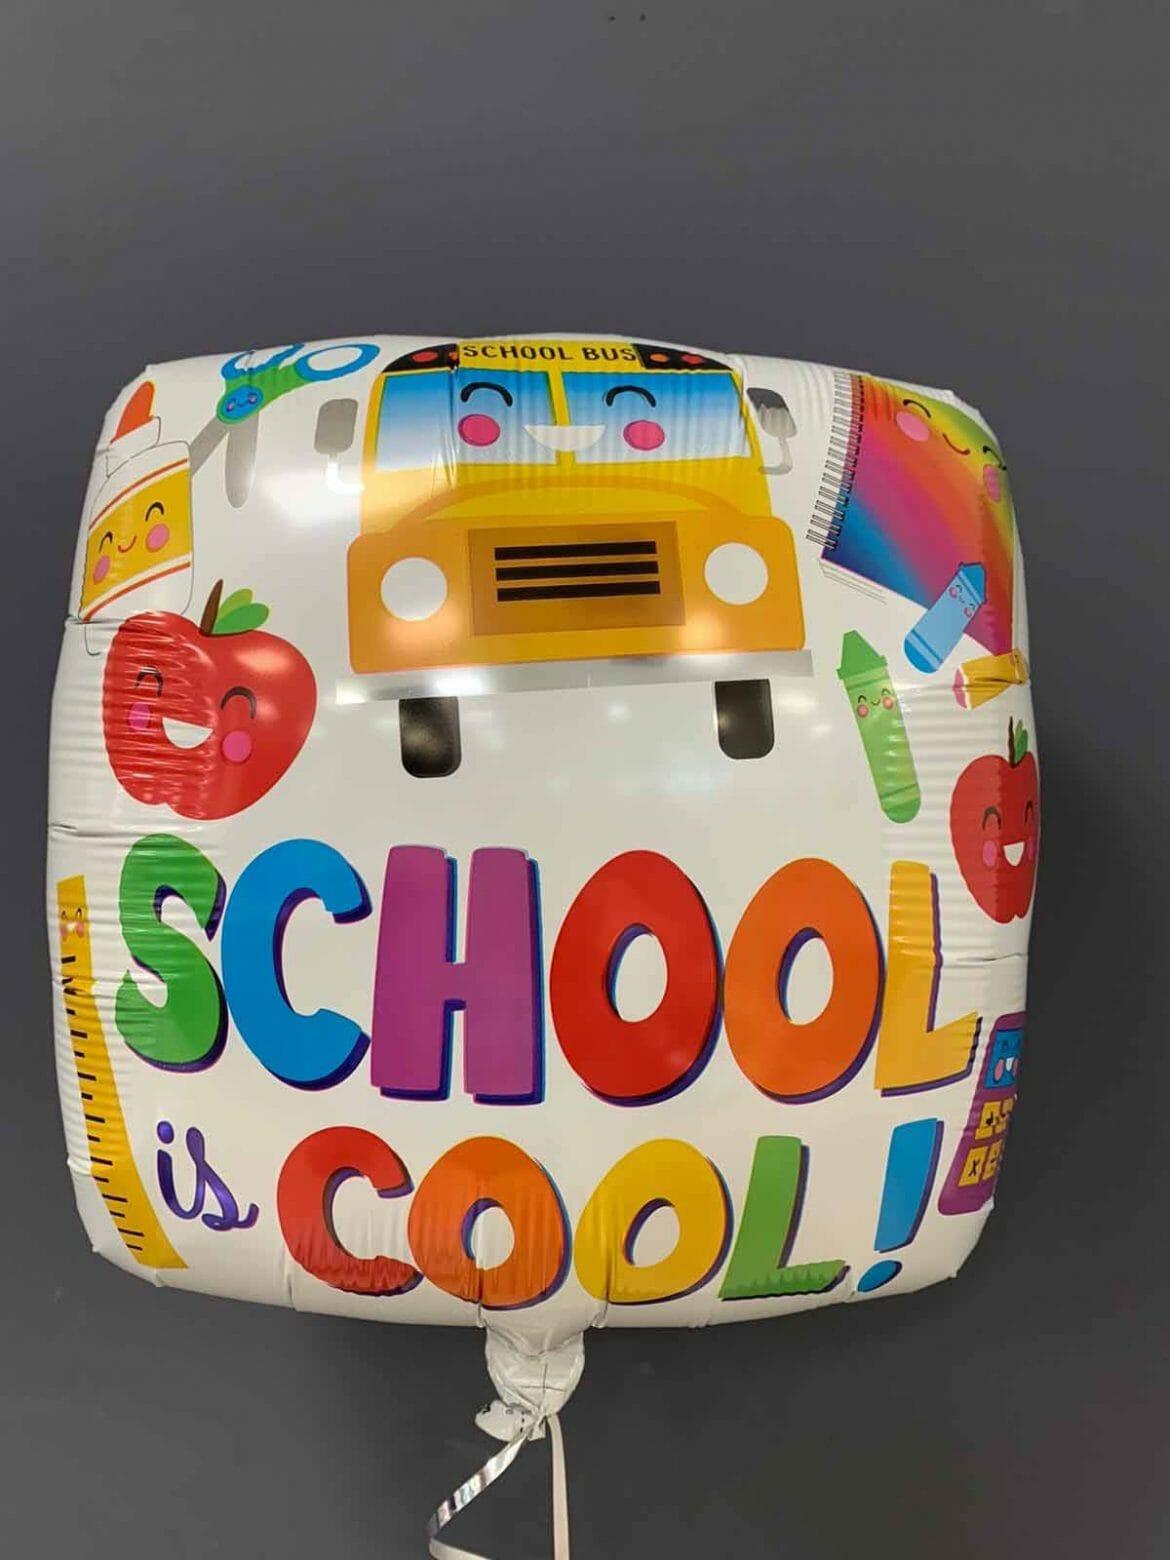 School is Cool € 5,90 1